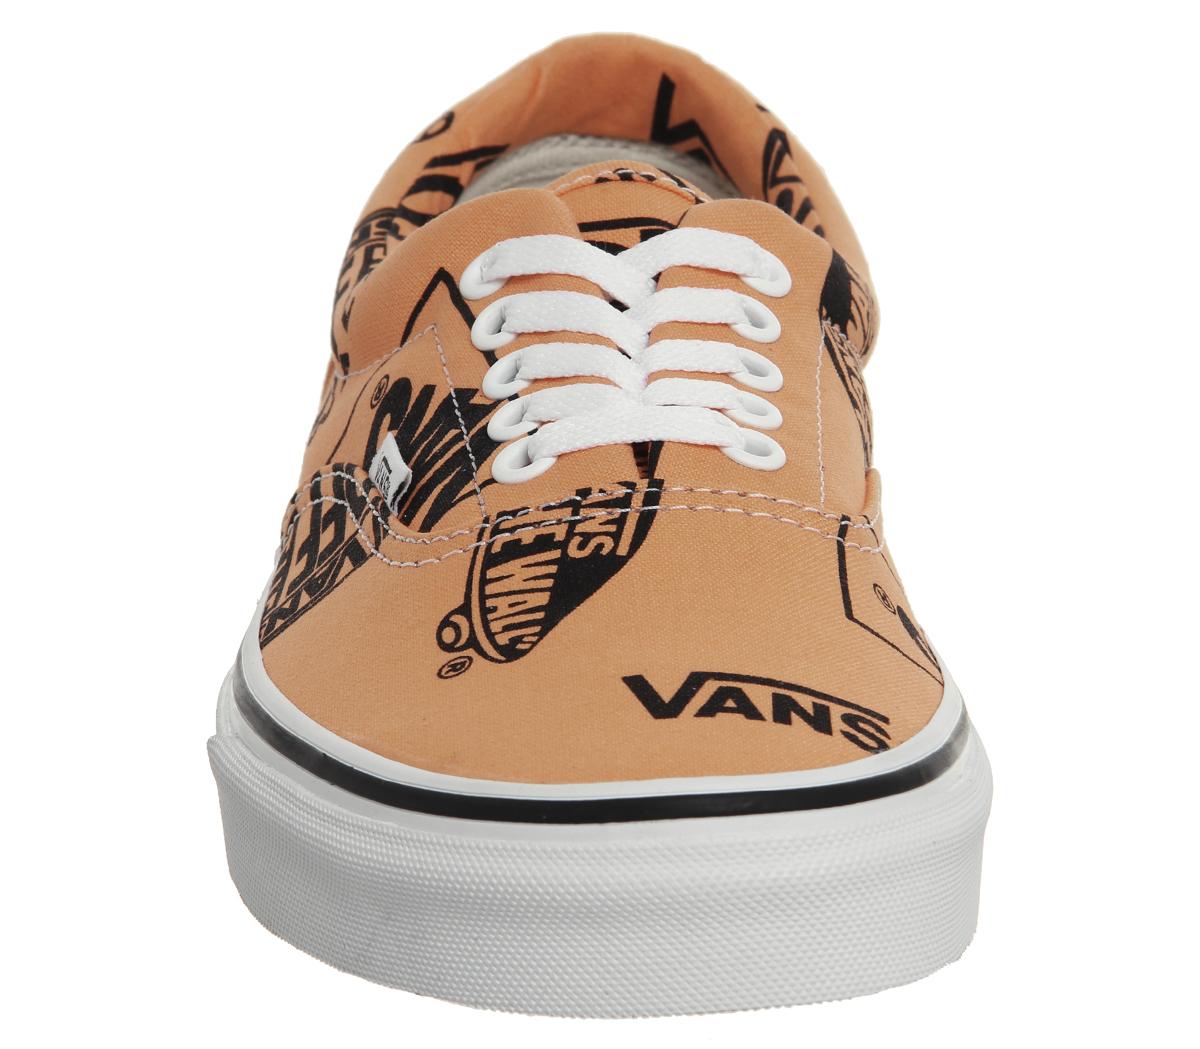 52ddda245ef0 Mens Vans Era Trainers Tangerine Black Logo Trainers Shoes